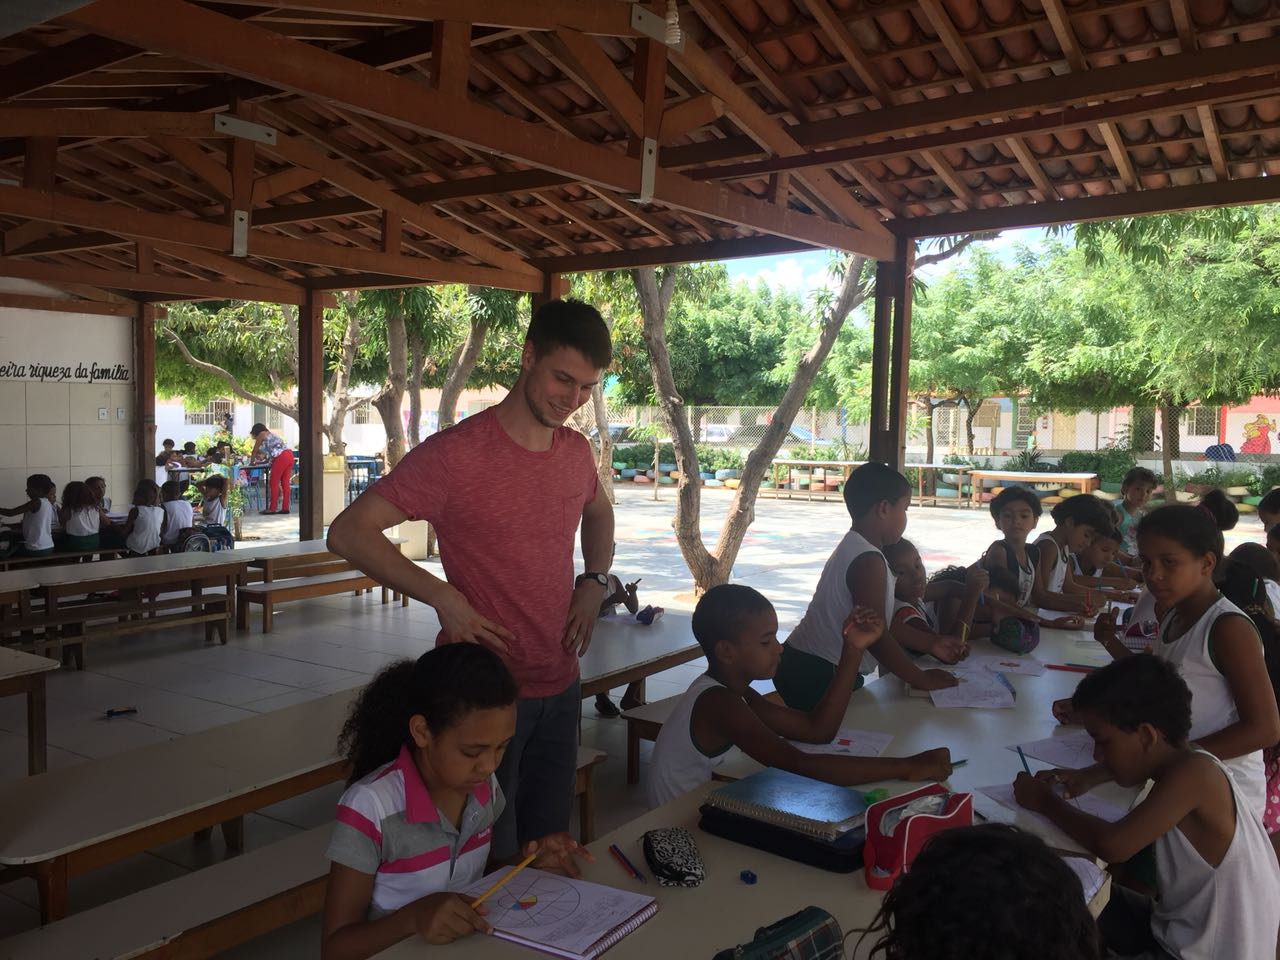 Gira Mundo | Creativity and Education | Brazil (November)